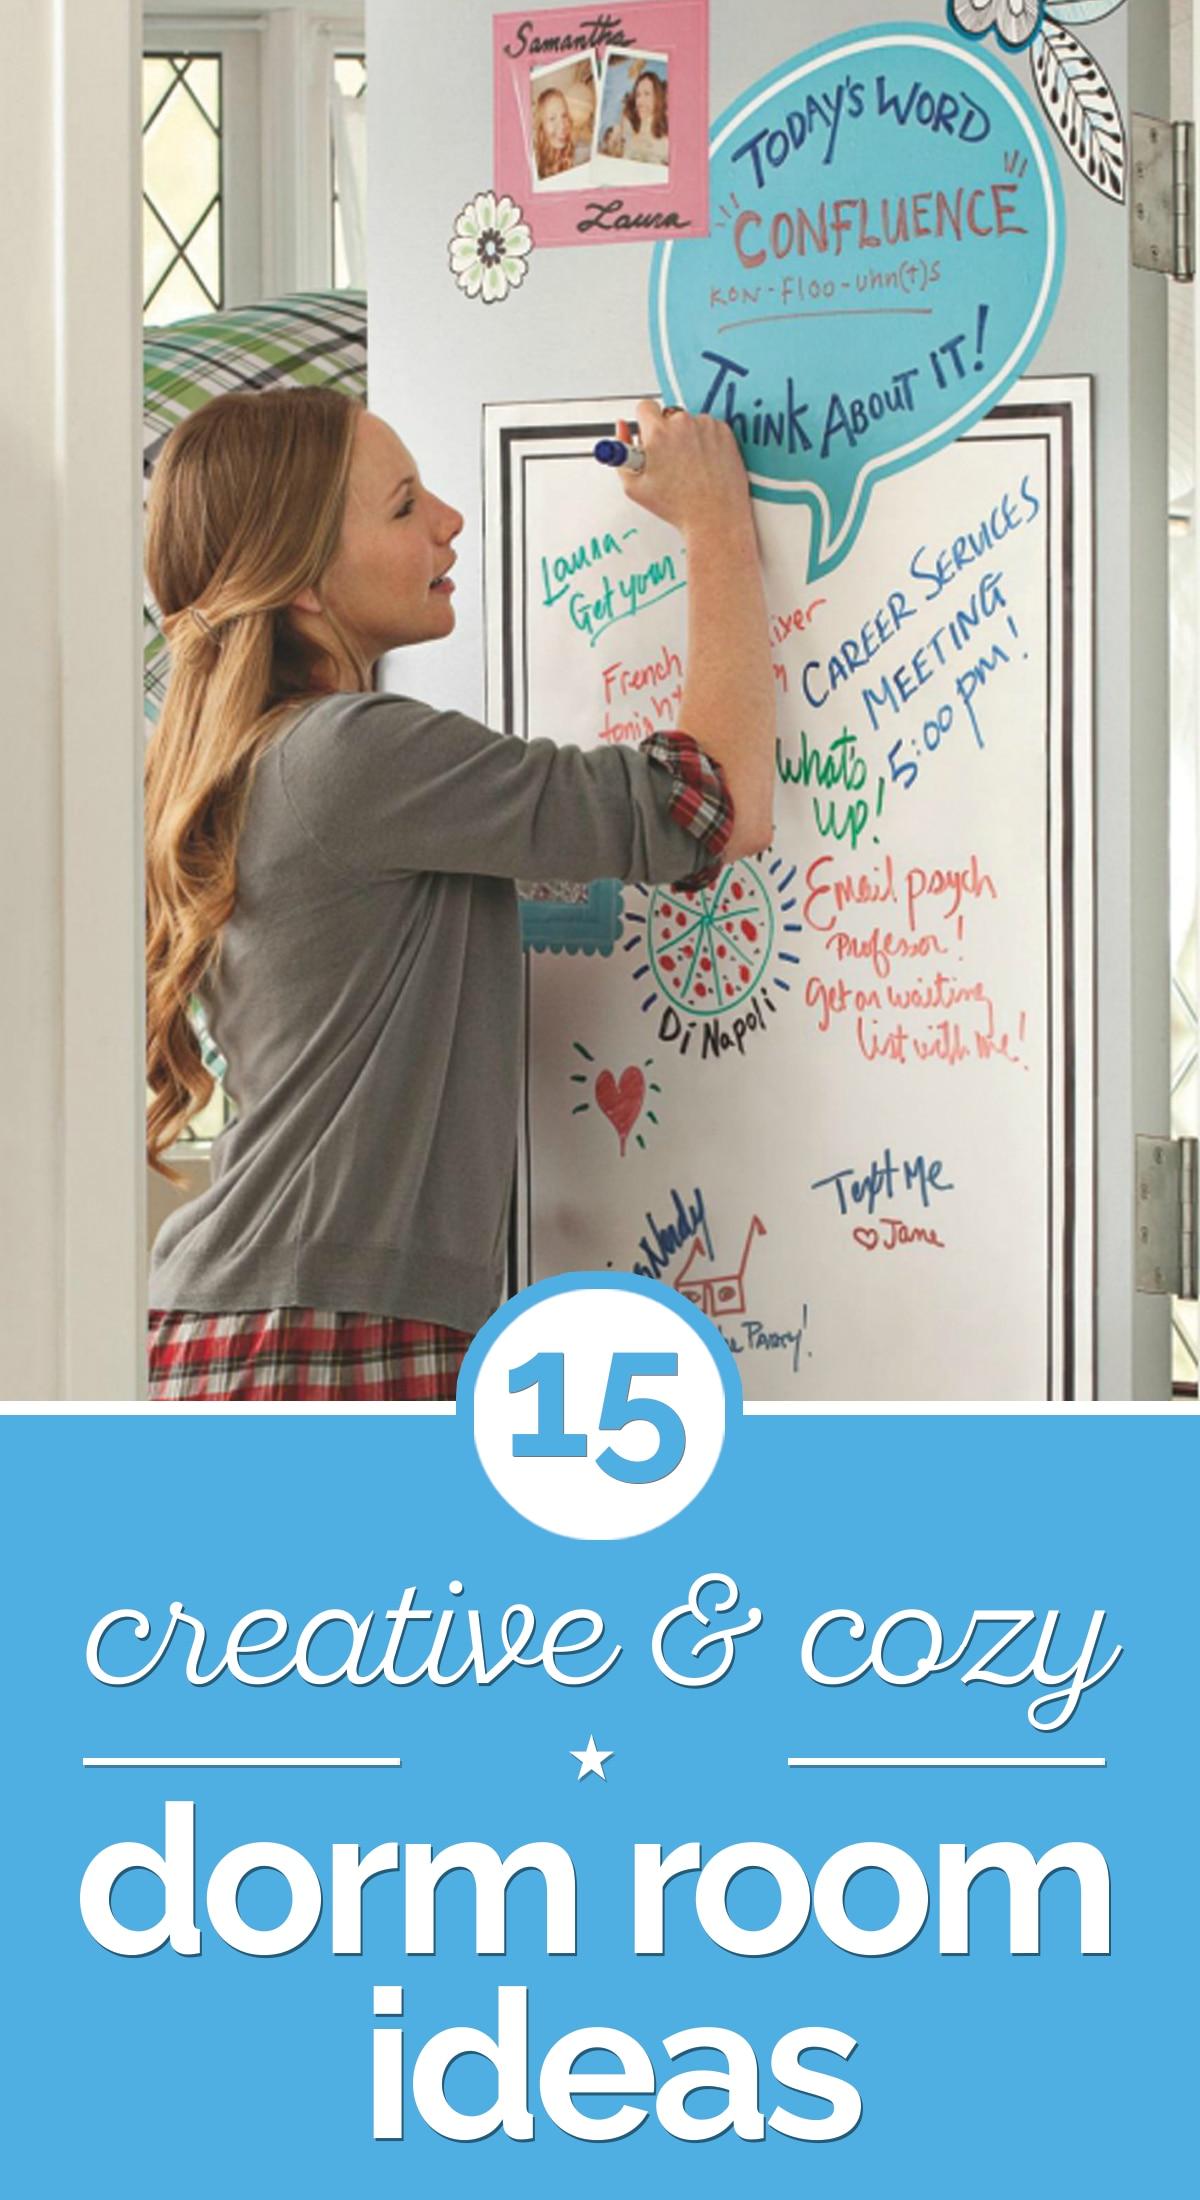 Typical Dorm Room: 15 Creative & Cozy Dorm Room Ideas